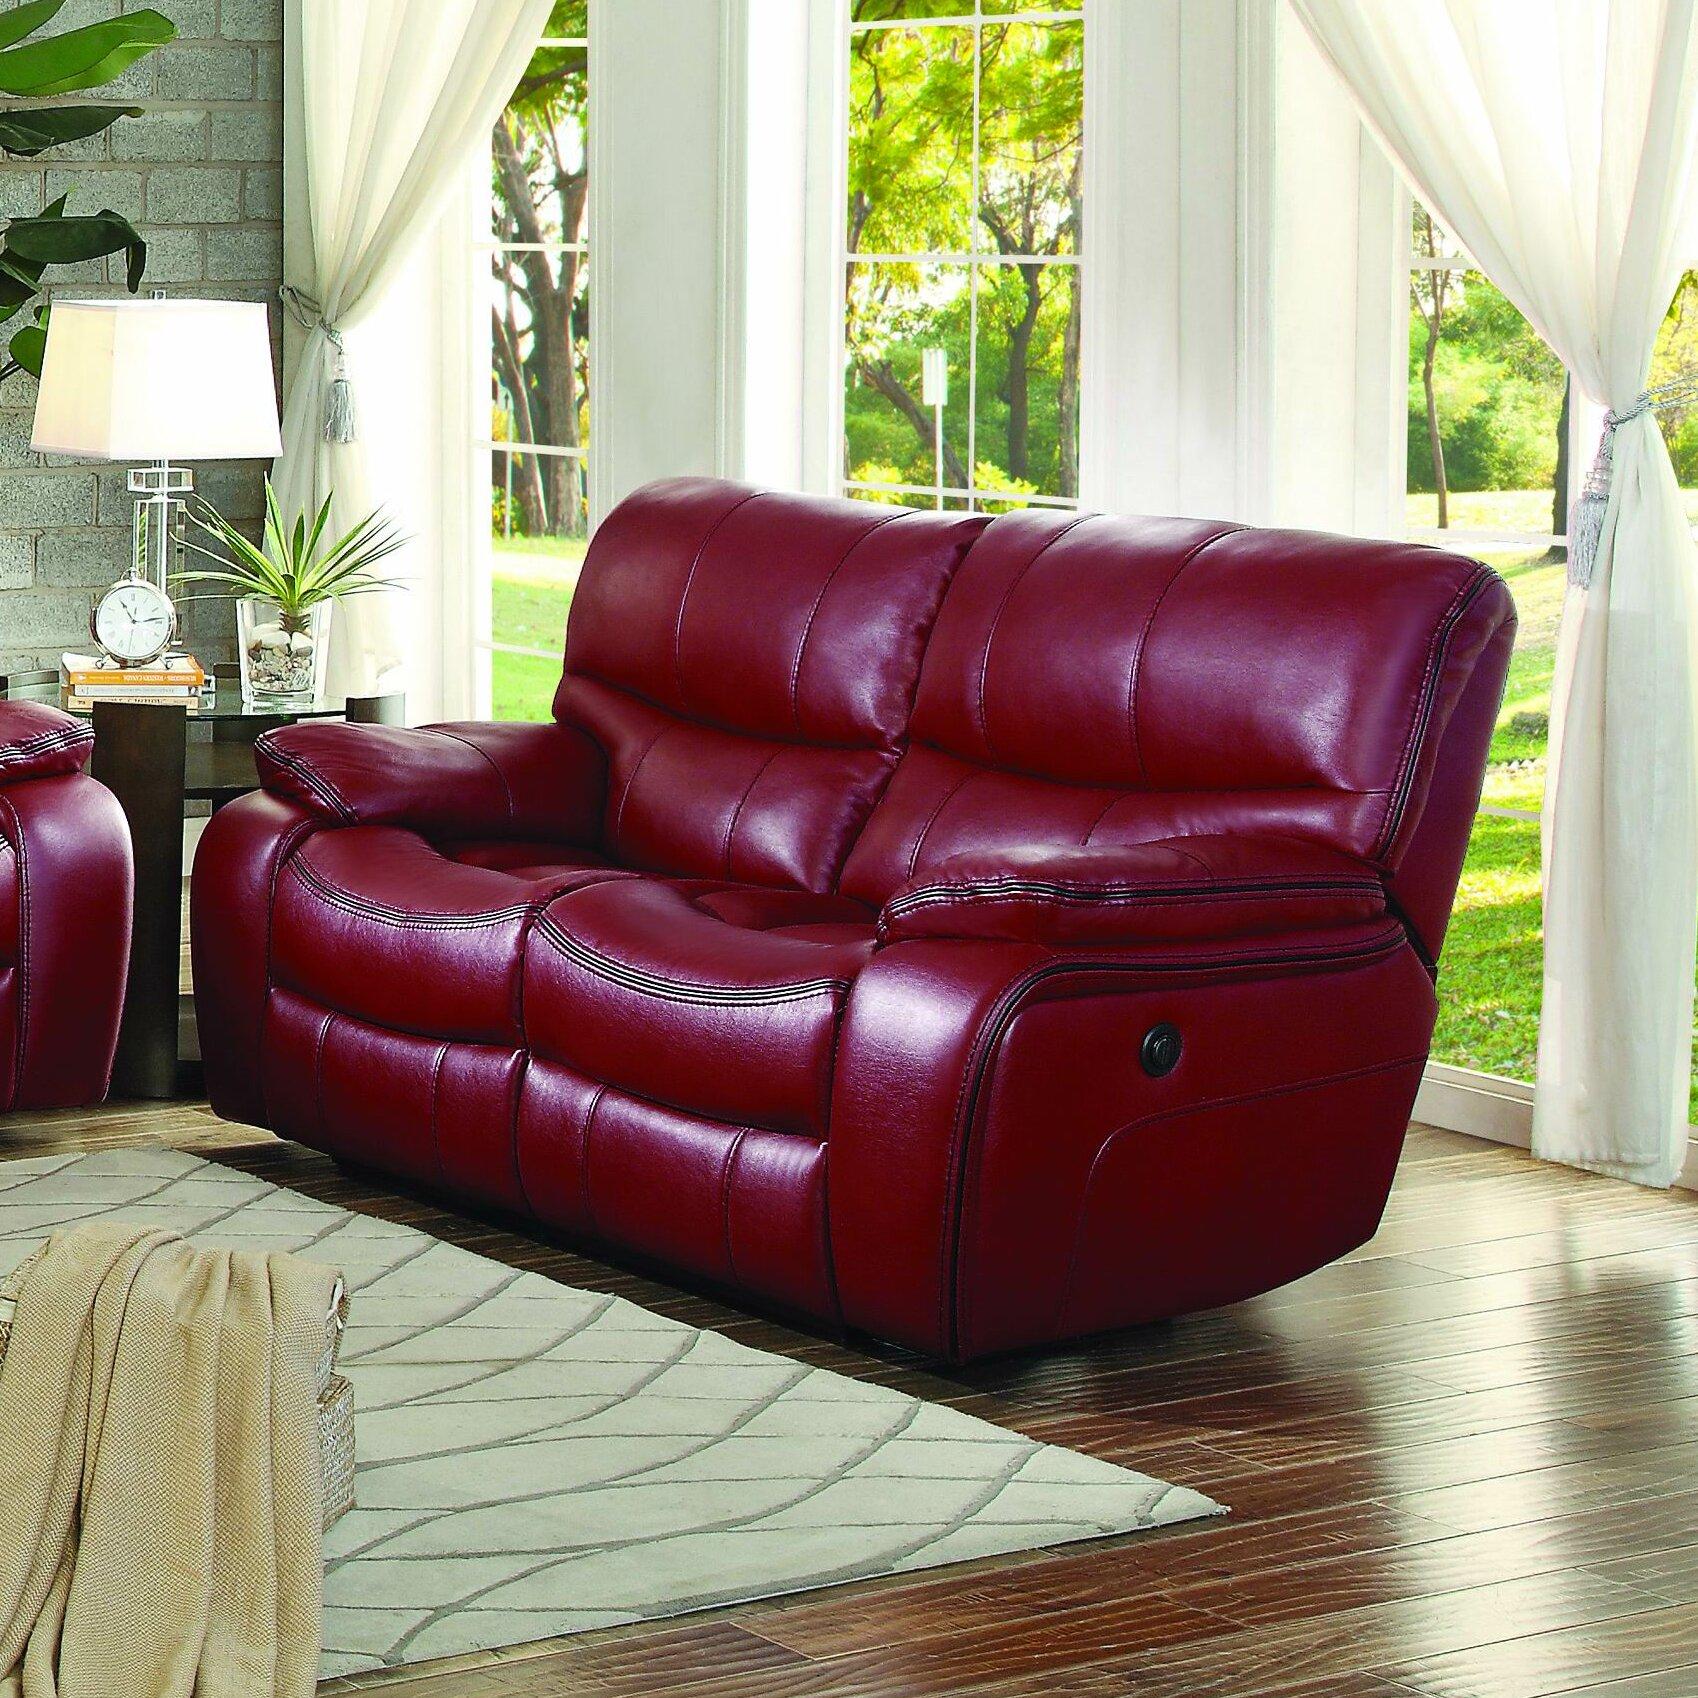 Red Barrel Studio Alejoa 65 Wide Faux Leather Pillow Top Arm Reclining Loveseat Reviews Wayfair